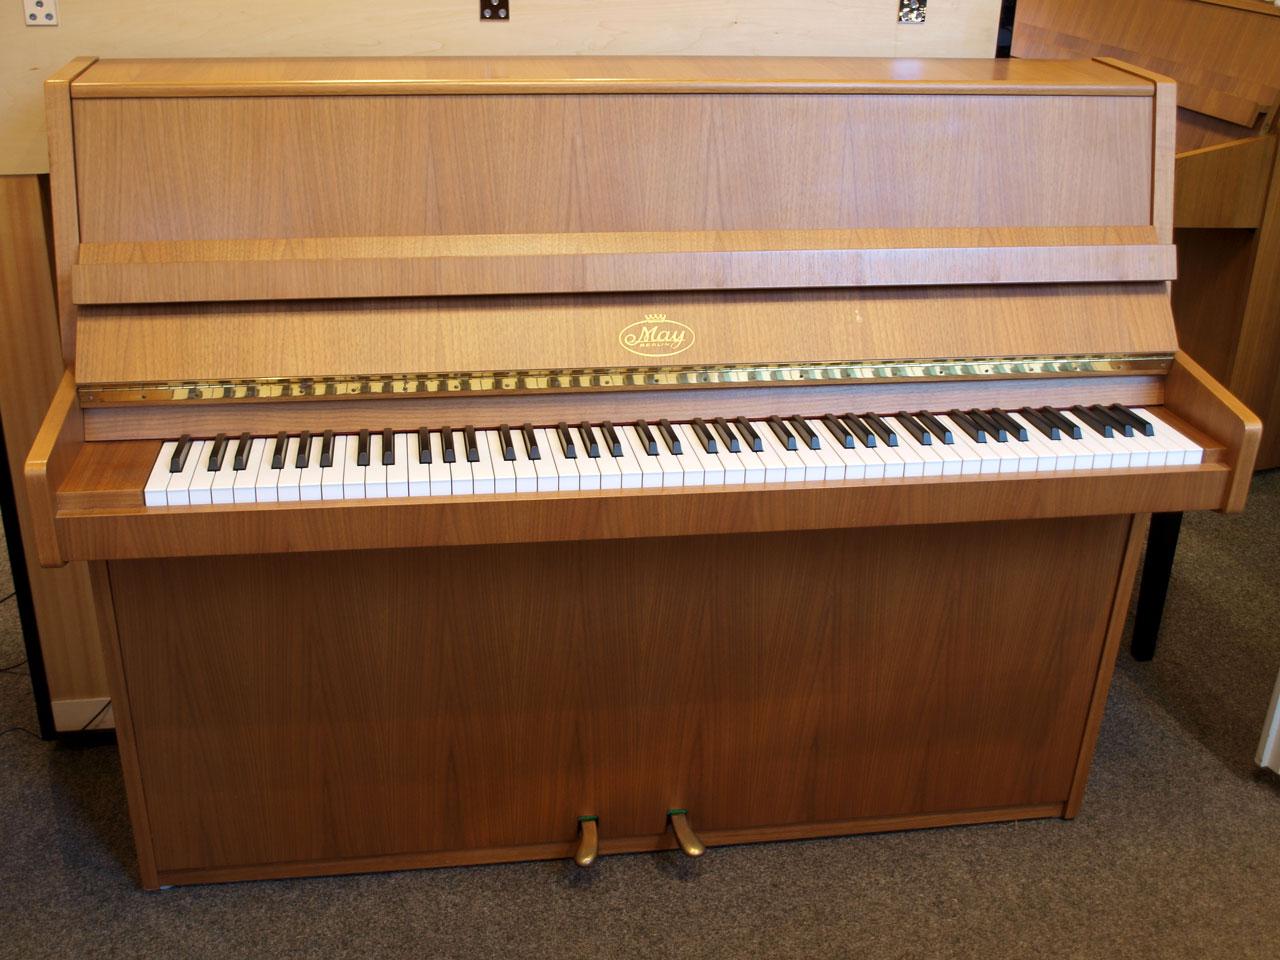 May - Klavier, Mod. 110